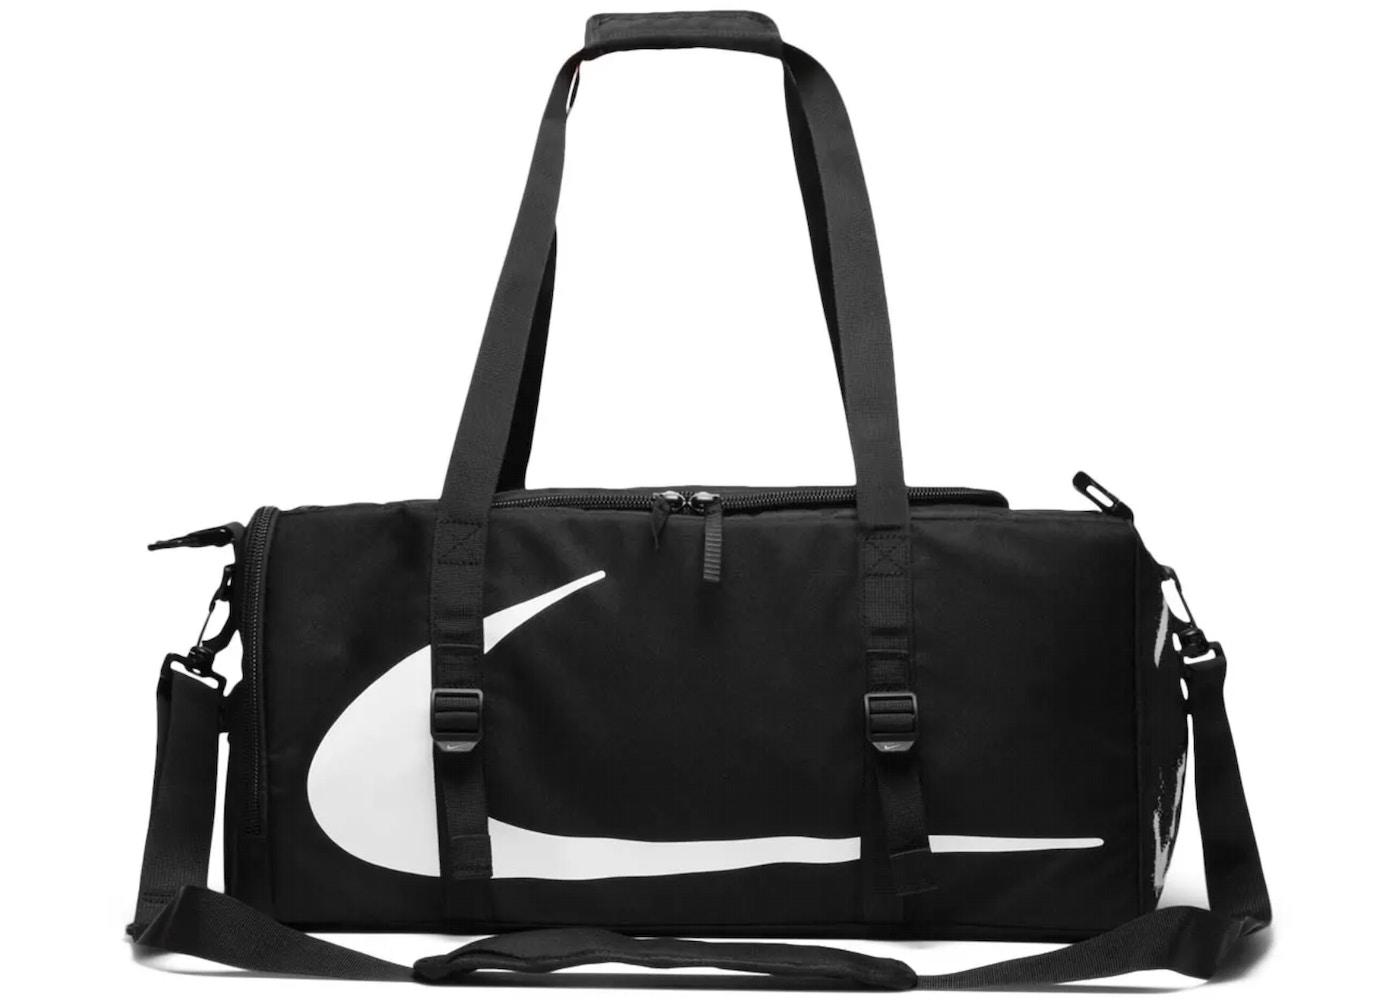 verdadero negocio super especiales Estados Unidos OFF-WHITE x Nike Duffle/Waist Bag Combo Black - SS20